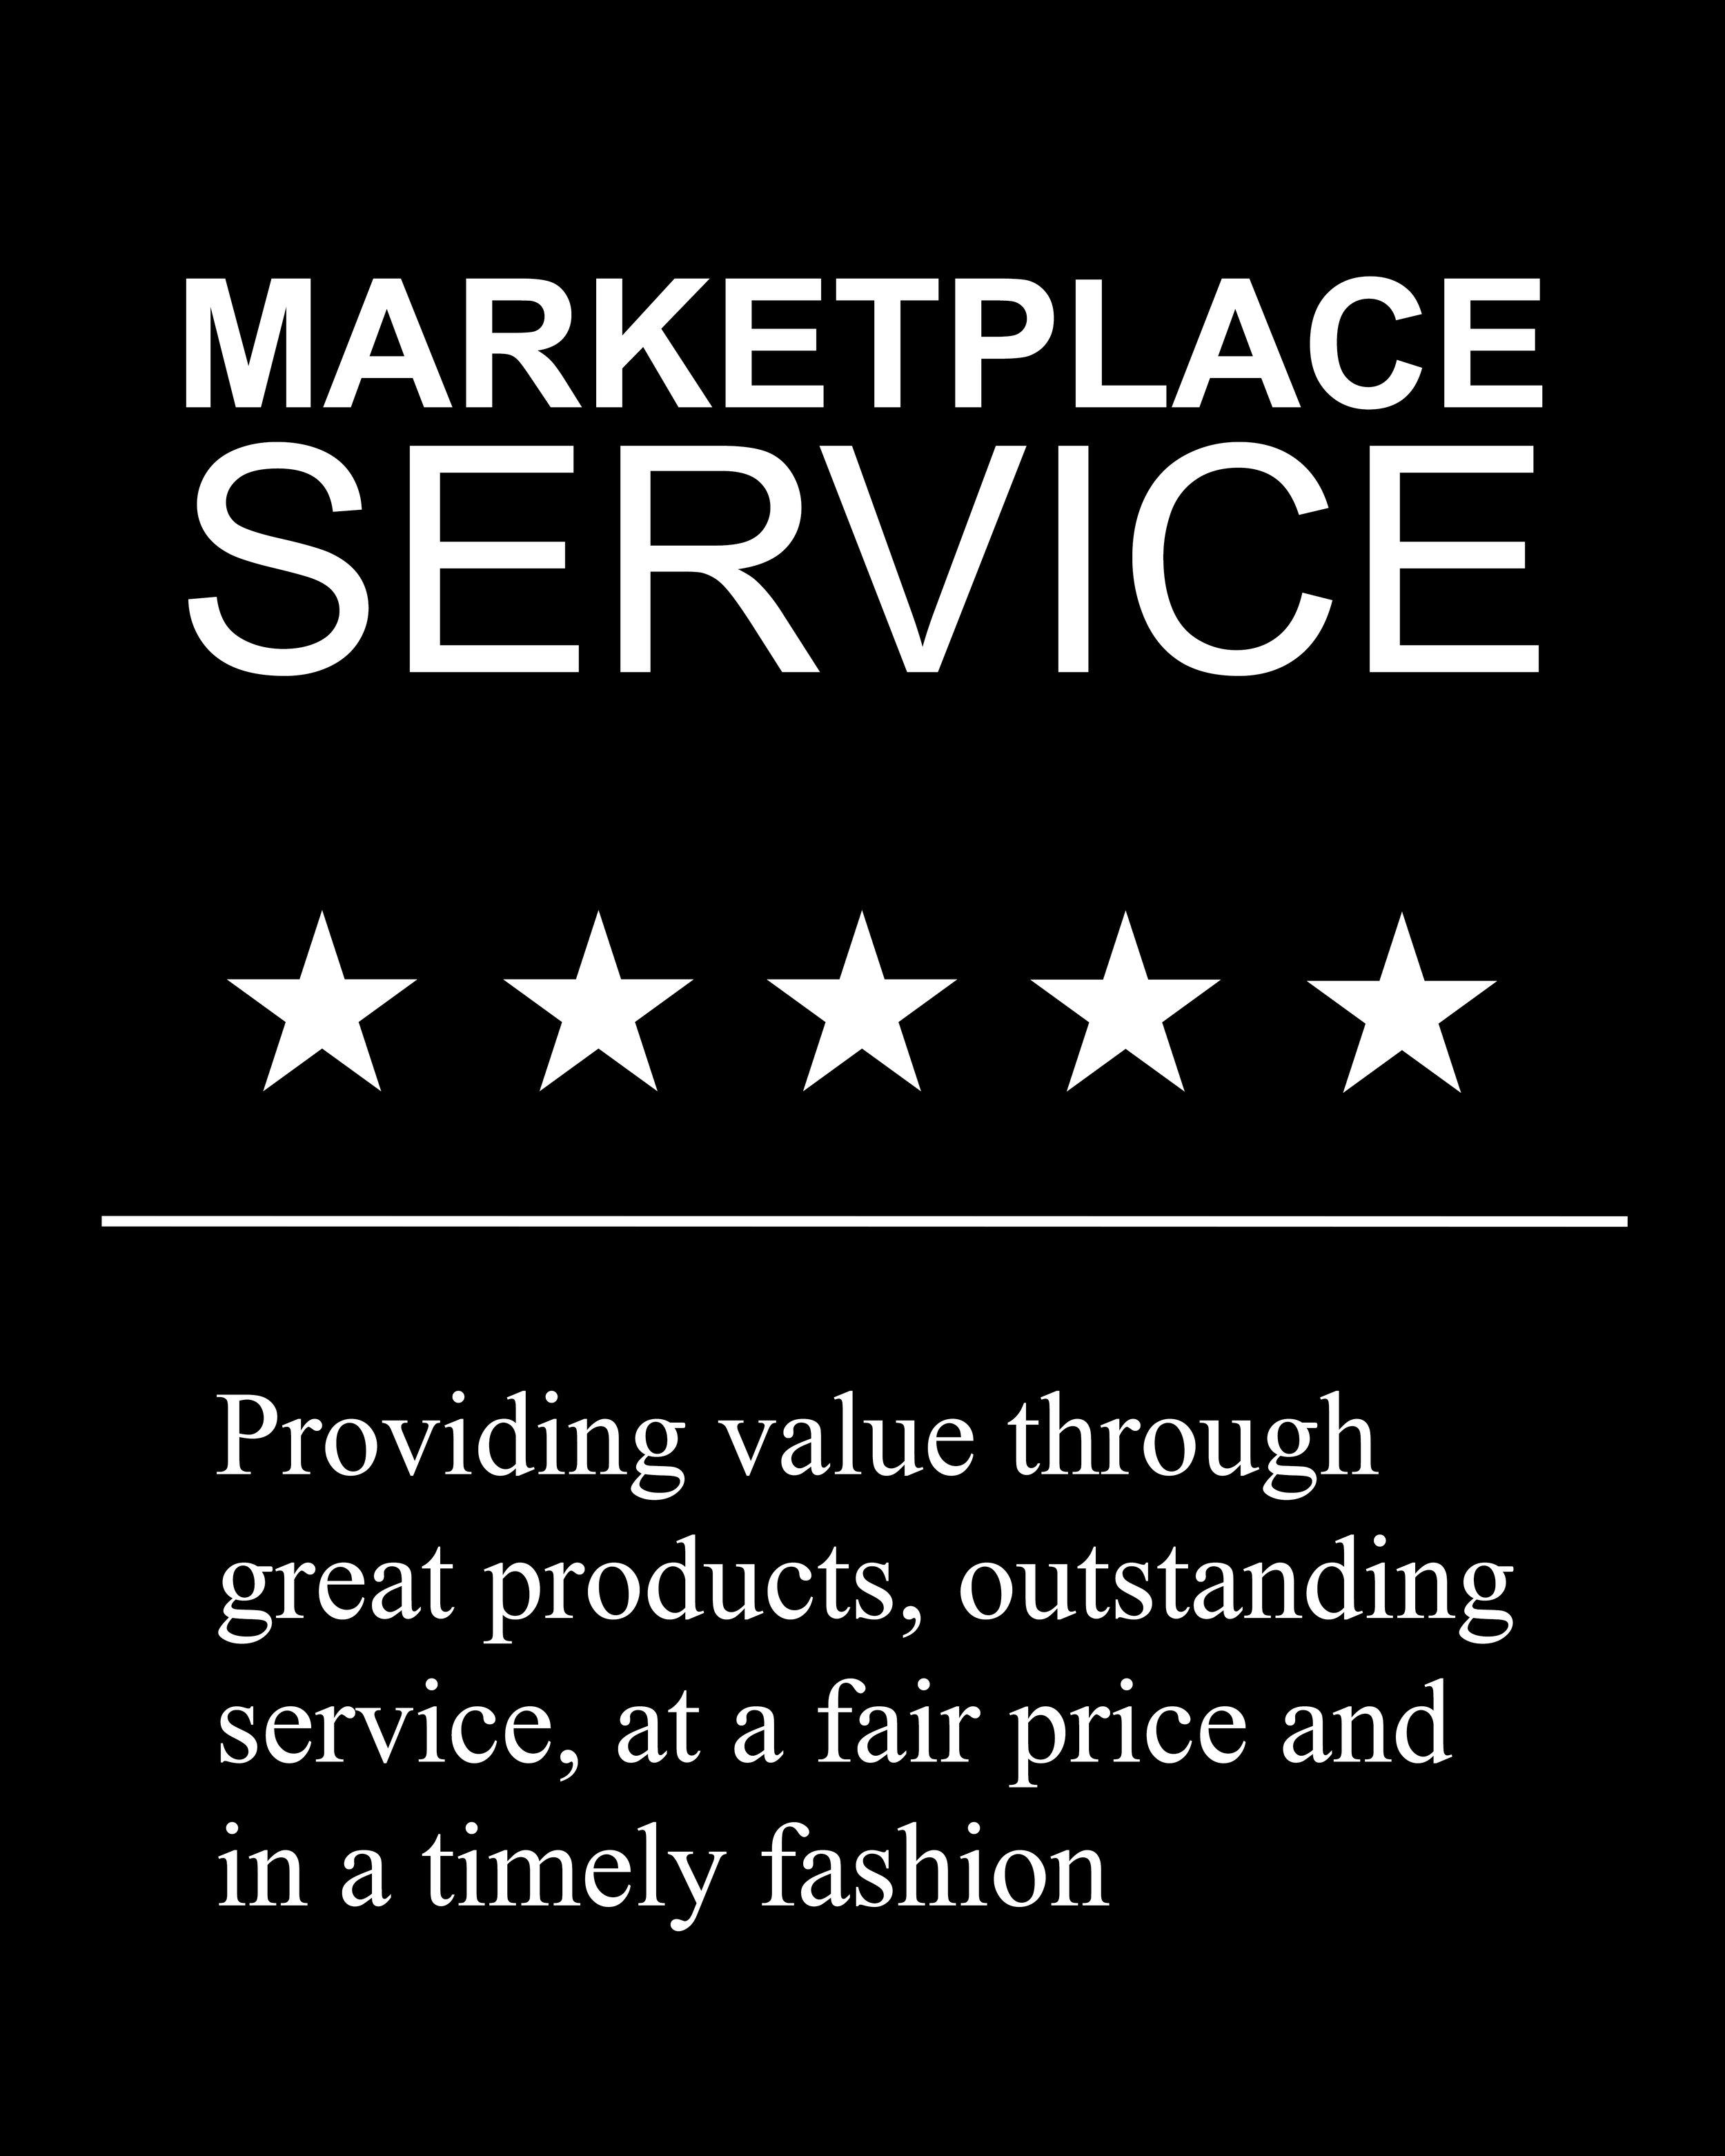 05 Marketplace Service.jpg